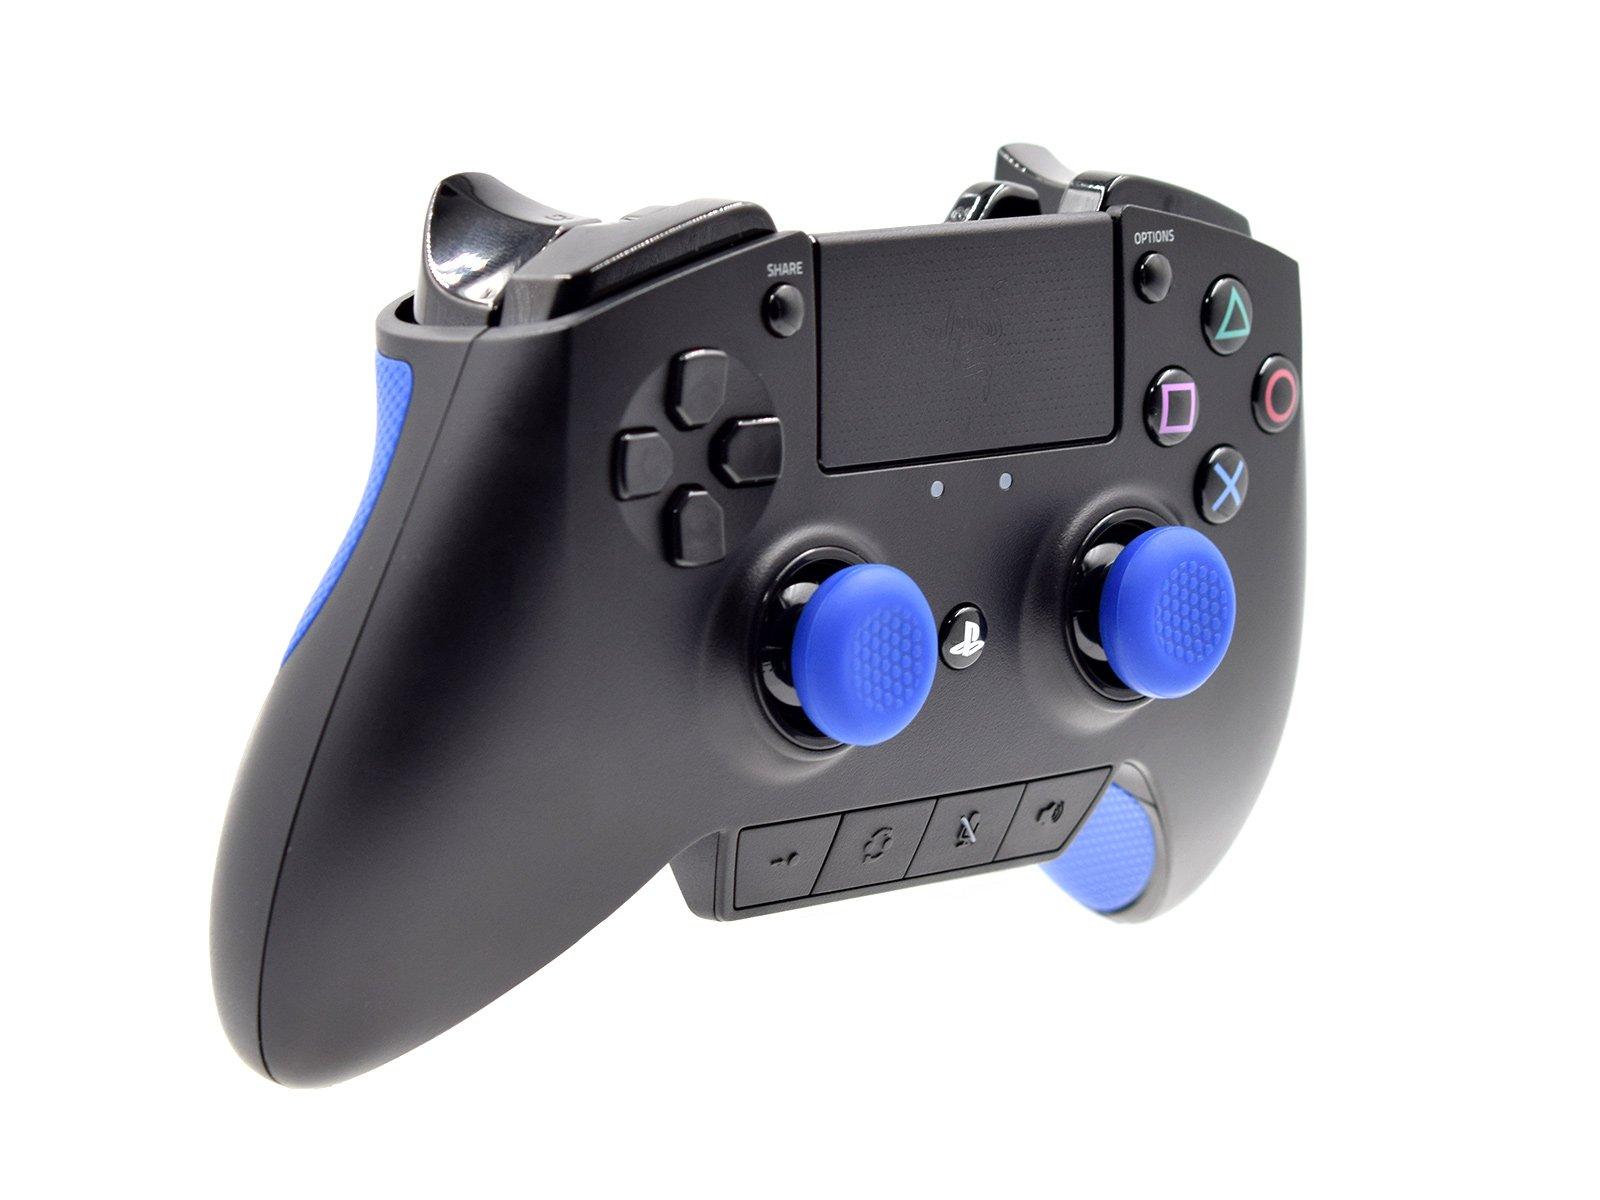 Razer Raiju Pro Controller For PS4 - Three Quarters